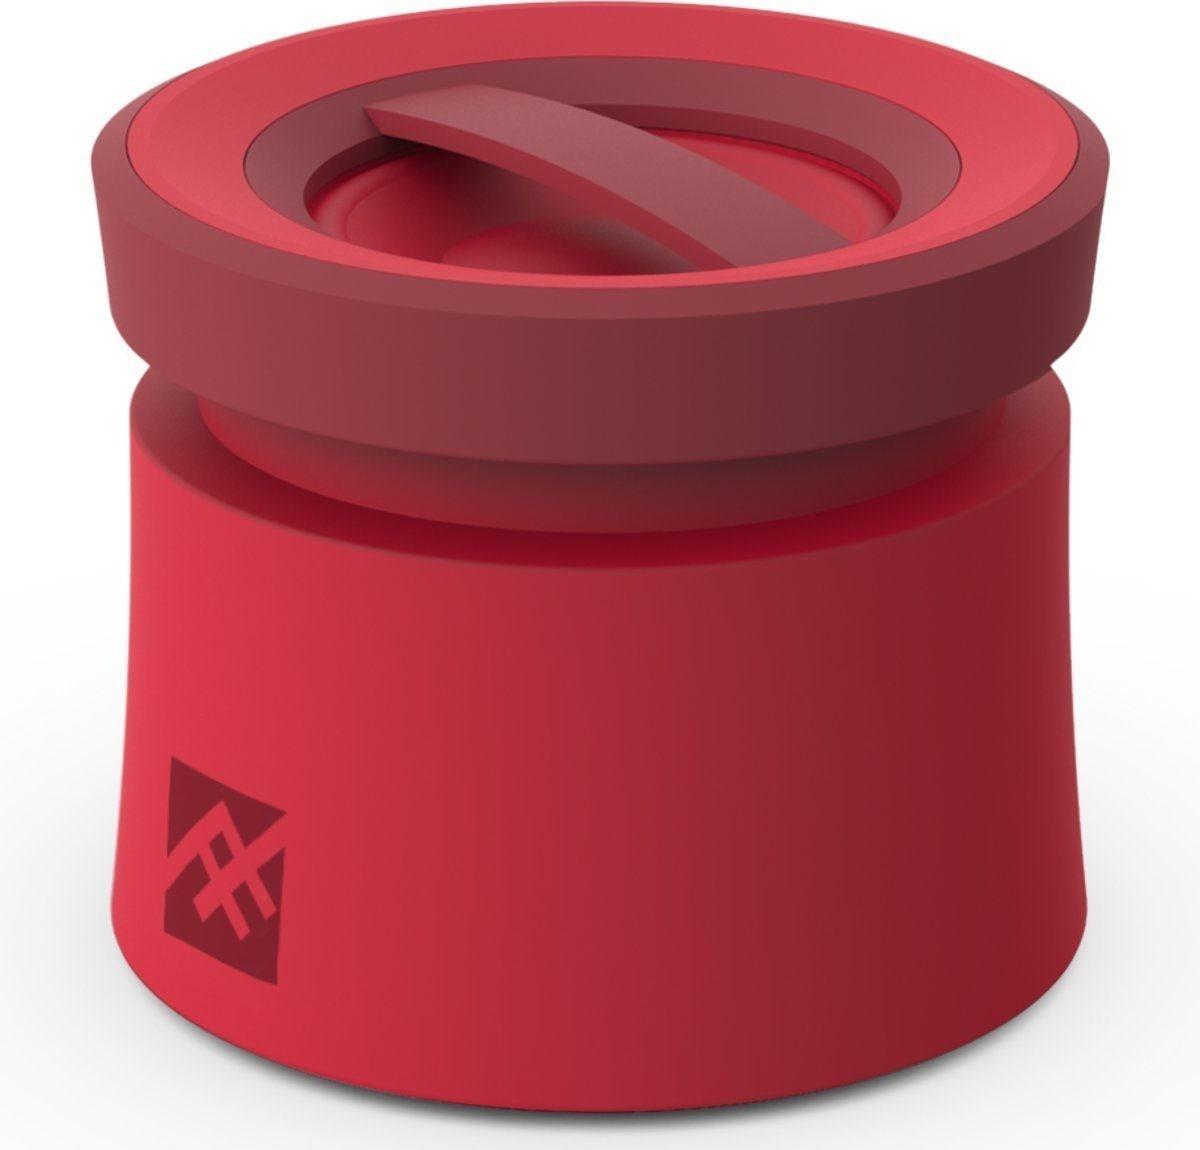 Image of ifrogz coda wireless Bluetooth Speaker red